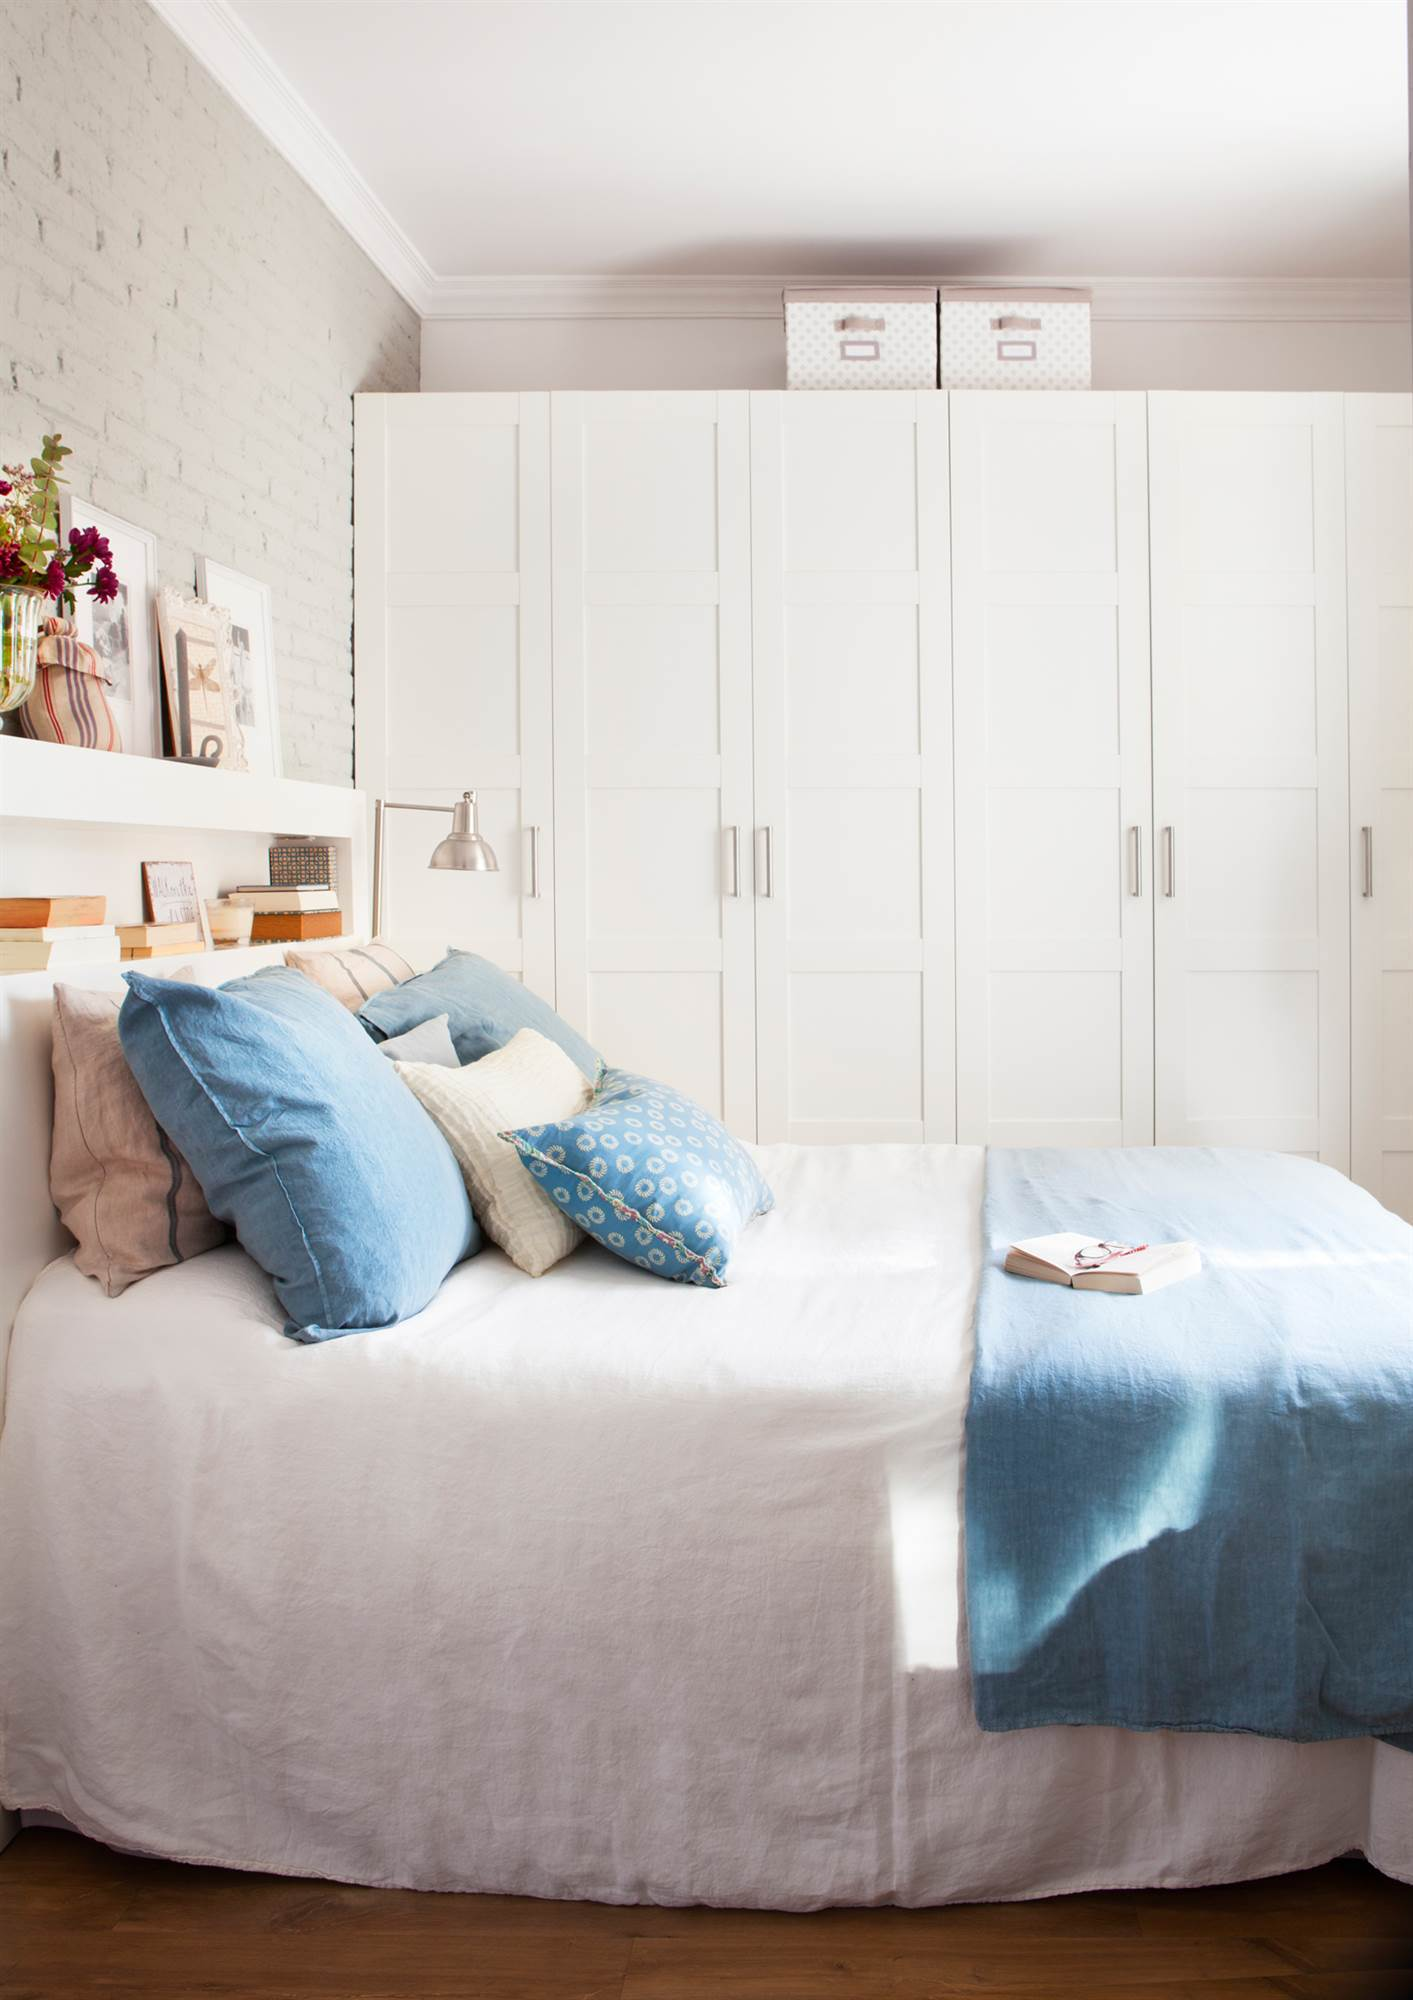 dormitorios-matrimonio-modernos-nordico-elmueble